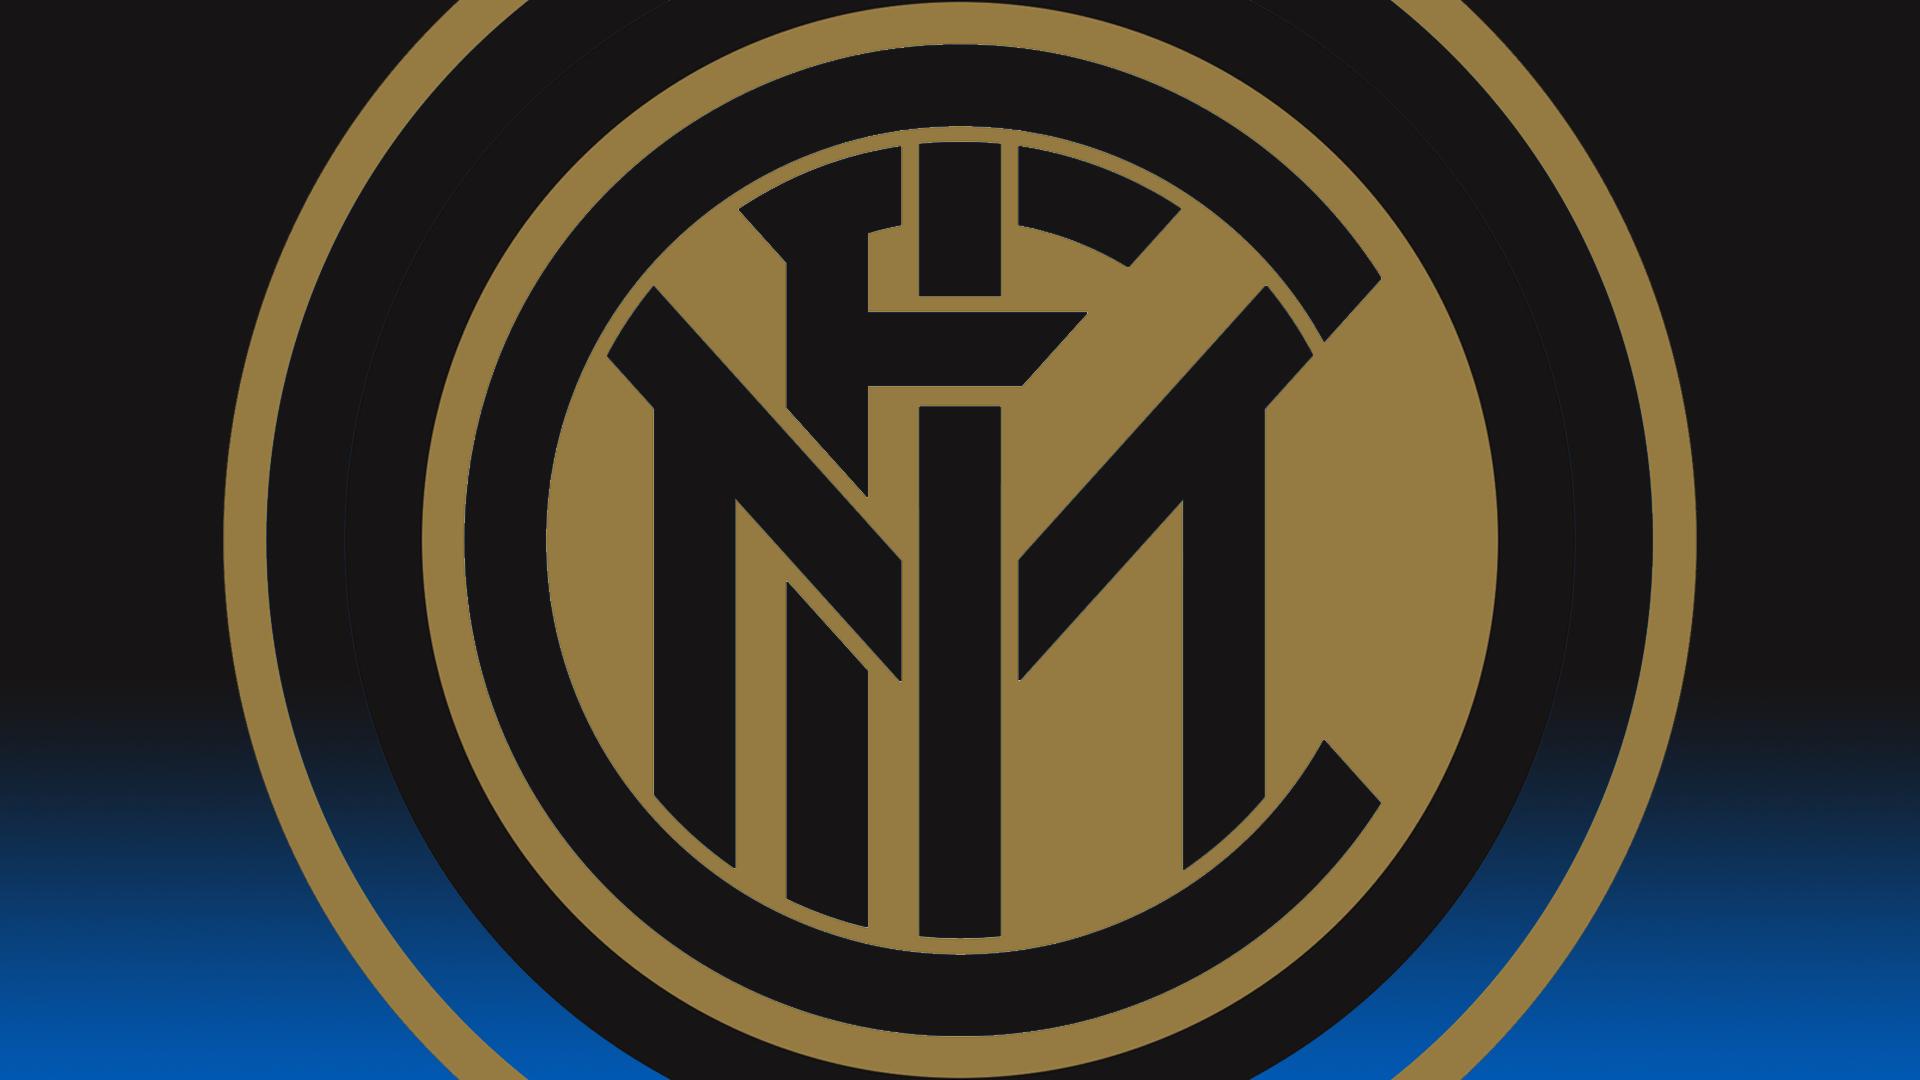 5041771 1920x1080 Logo, Soccer, Emblem, Inter Milan.